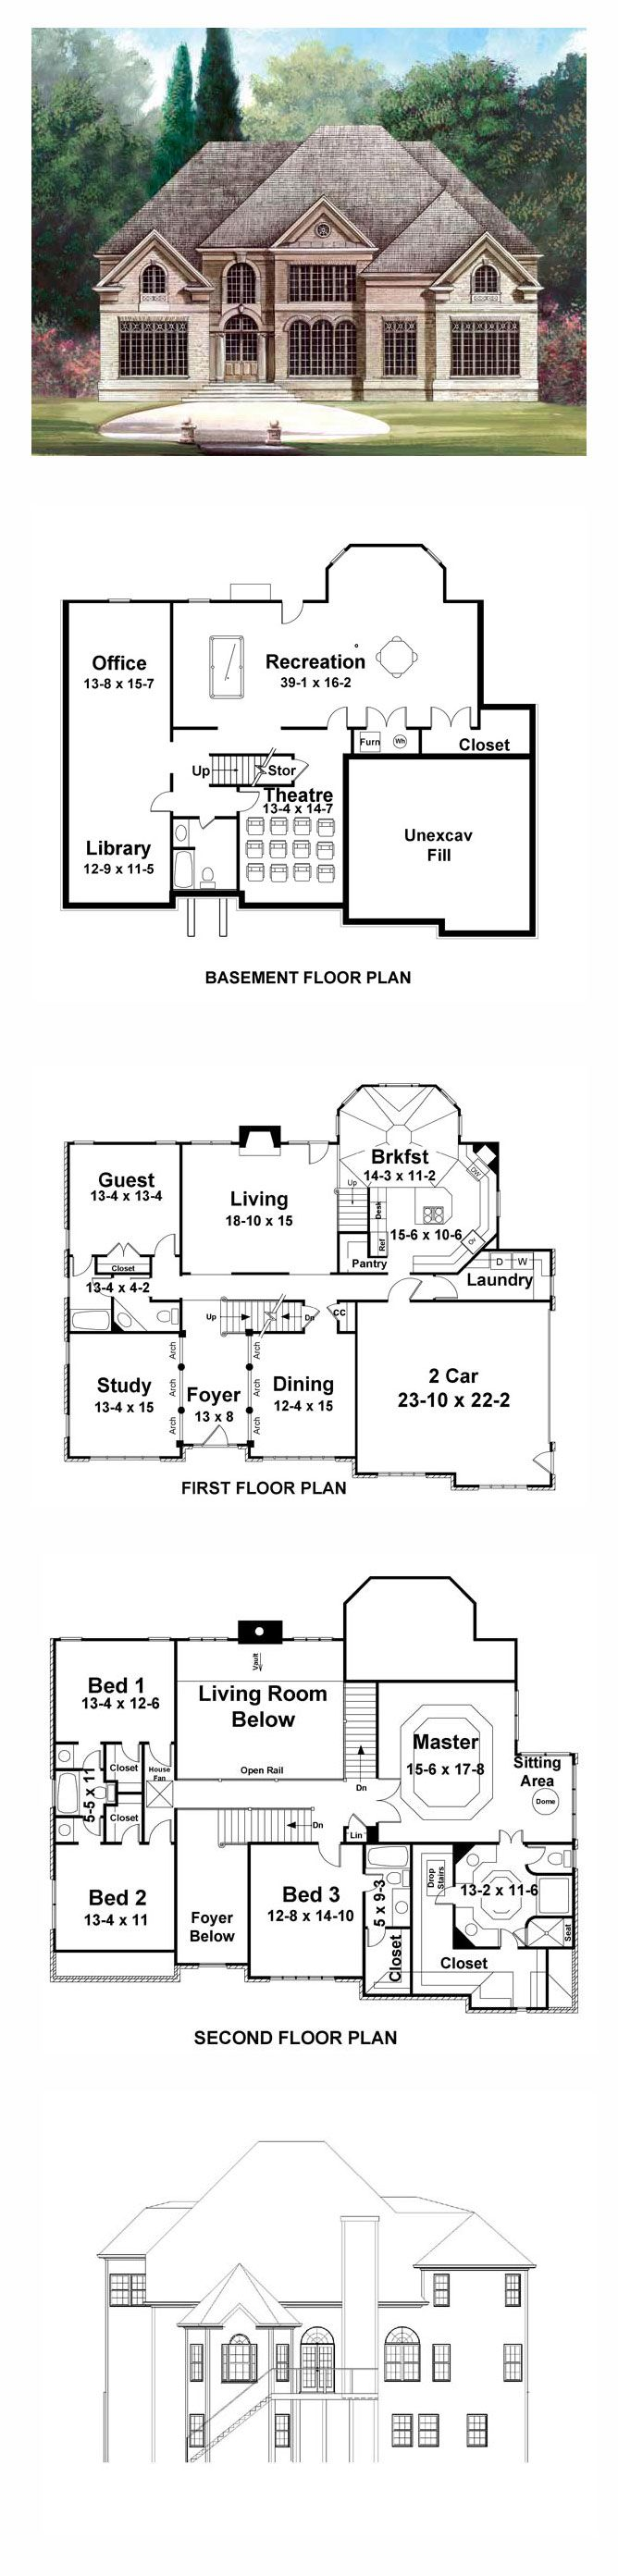 Greek Revival House Plan 72025   Total Living Area: 3254 sq. ft., 5 bedrooms and 4 bathrooms. #greekrevivalhome